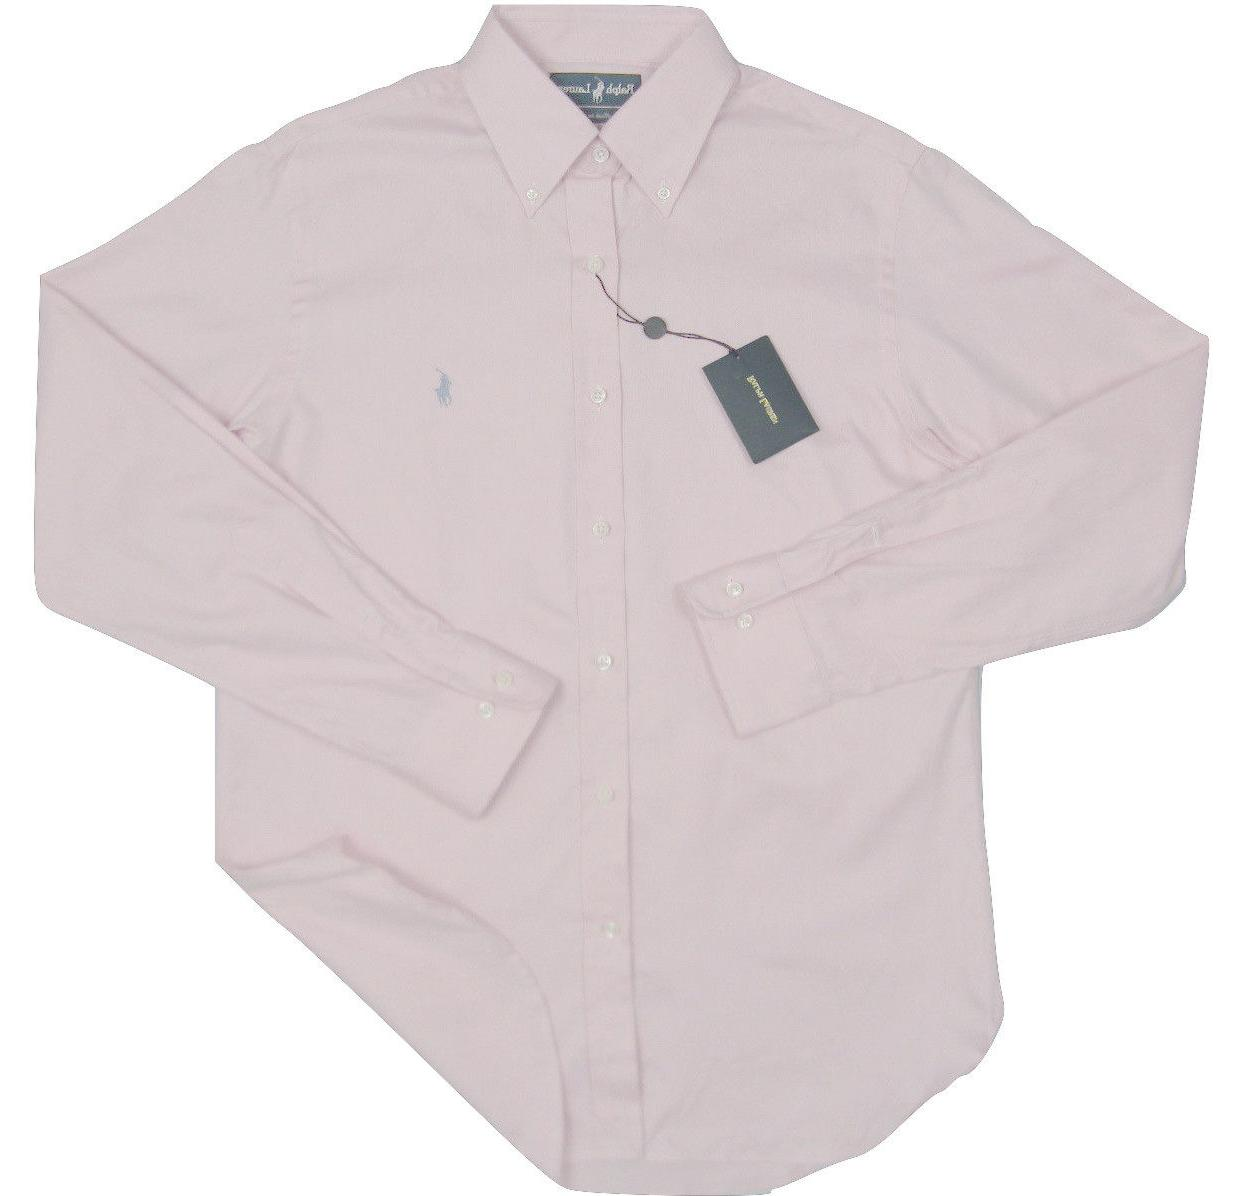 NEW $245 Ralph Lauren Pink Blue White Oxford*